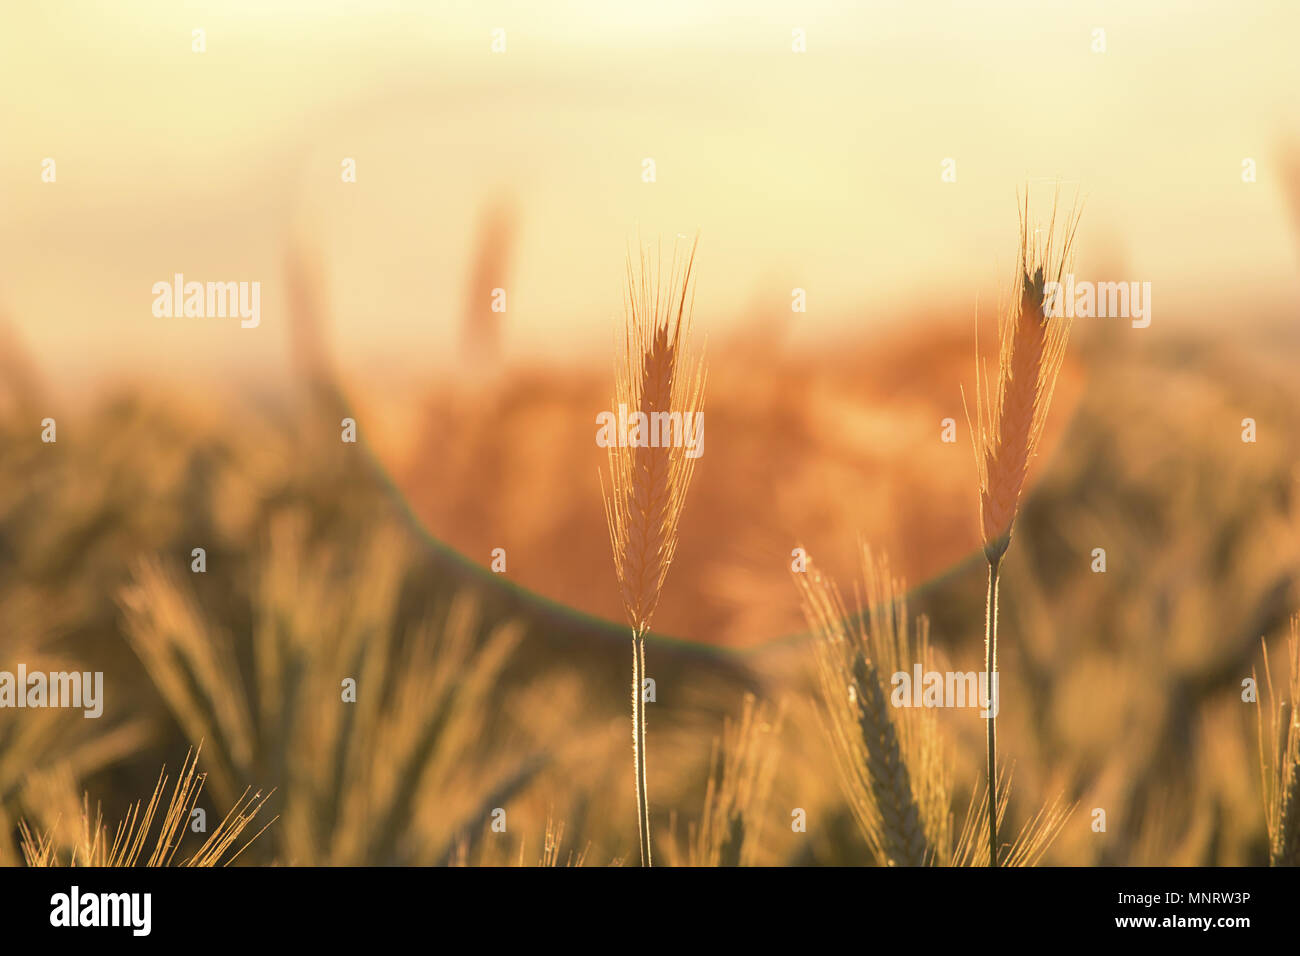 Wheat ears under the sunshine. Sun shining through ripe wheat. Stock Photo